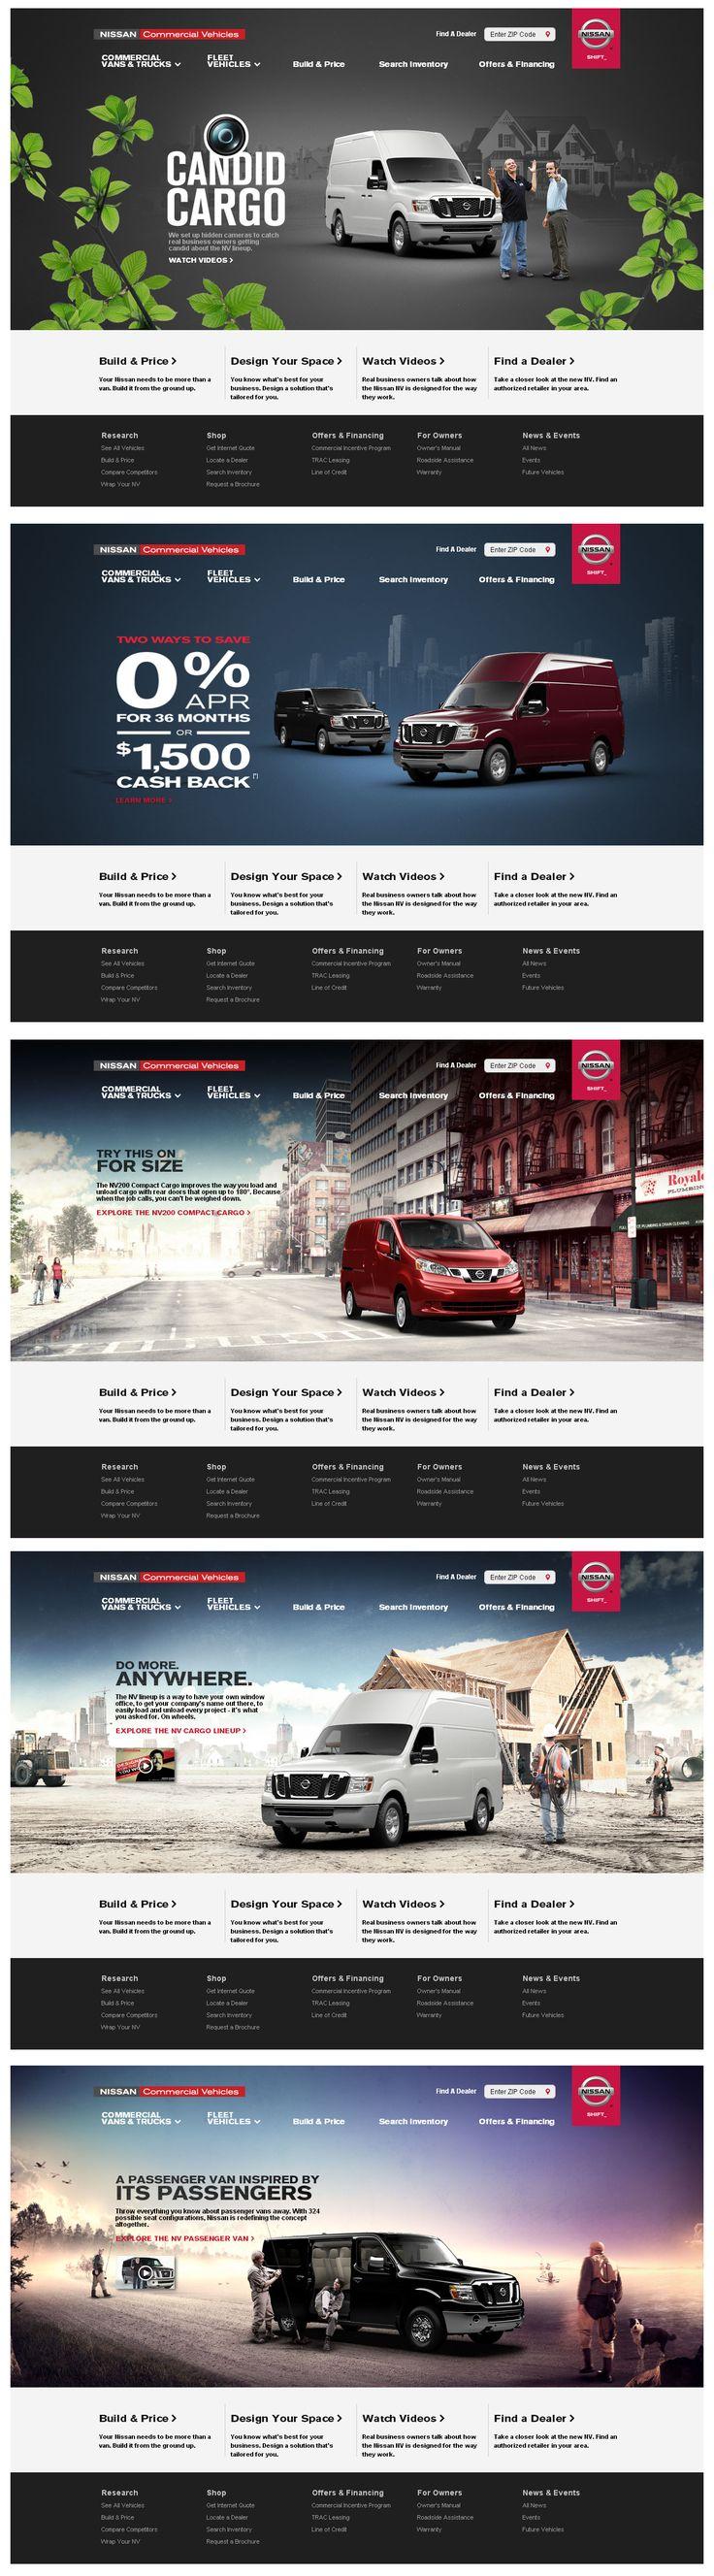 Nissan Commercial Vehicles  http://www.nissancommercialvehicles.com/